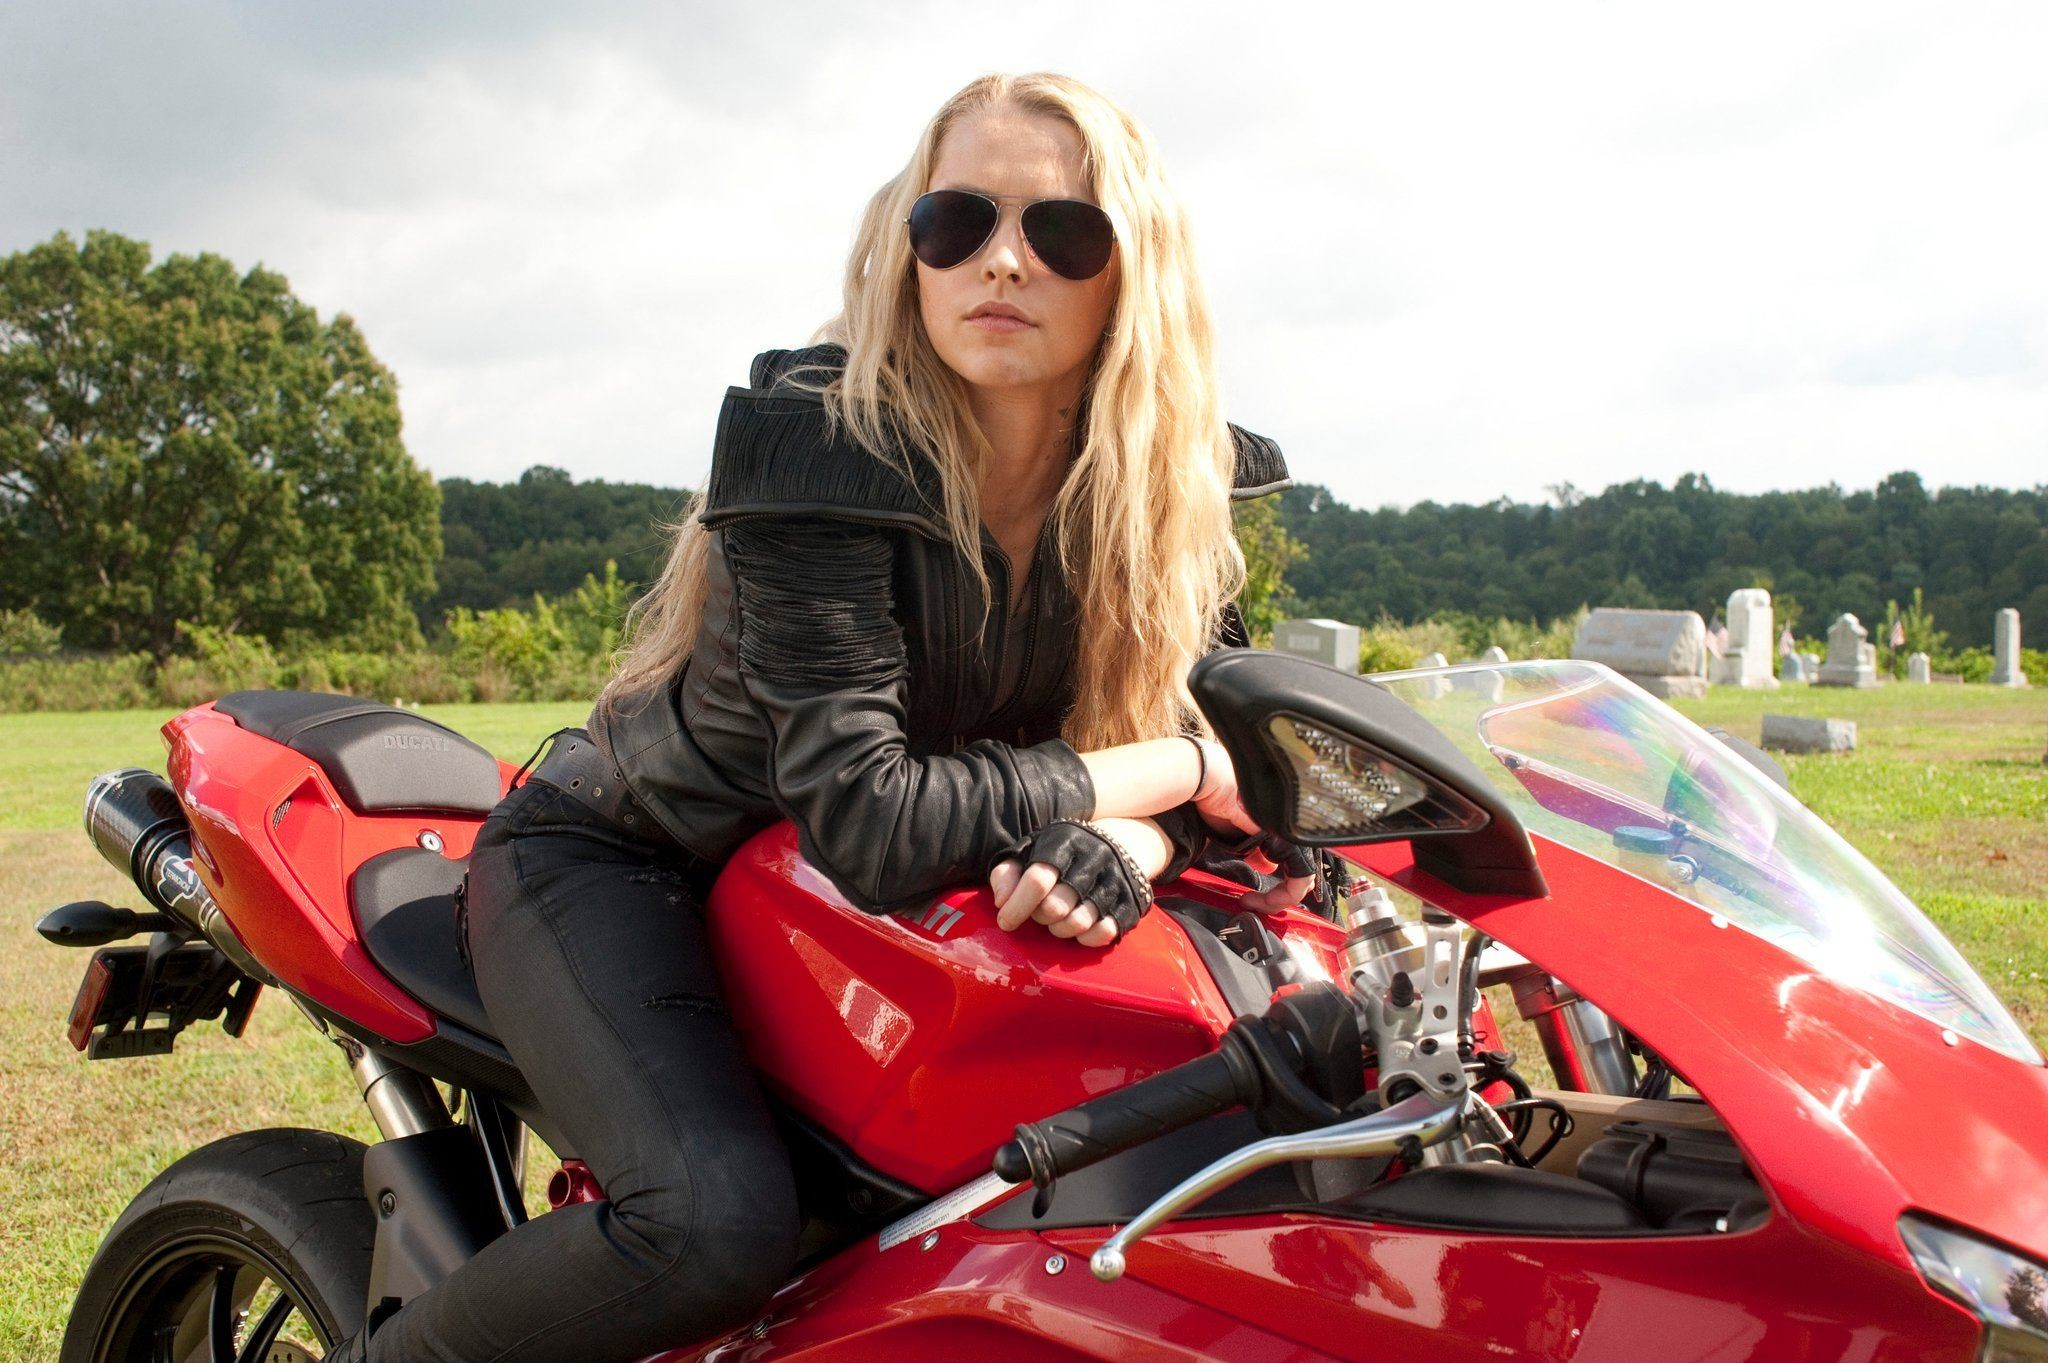 Ducati_Sportbike_848_I_Am_Number_Four_Blonde_Teresa_Palmer_women_females_girls_2048x1363